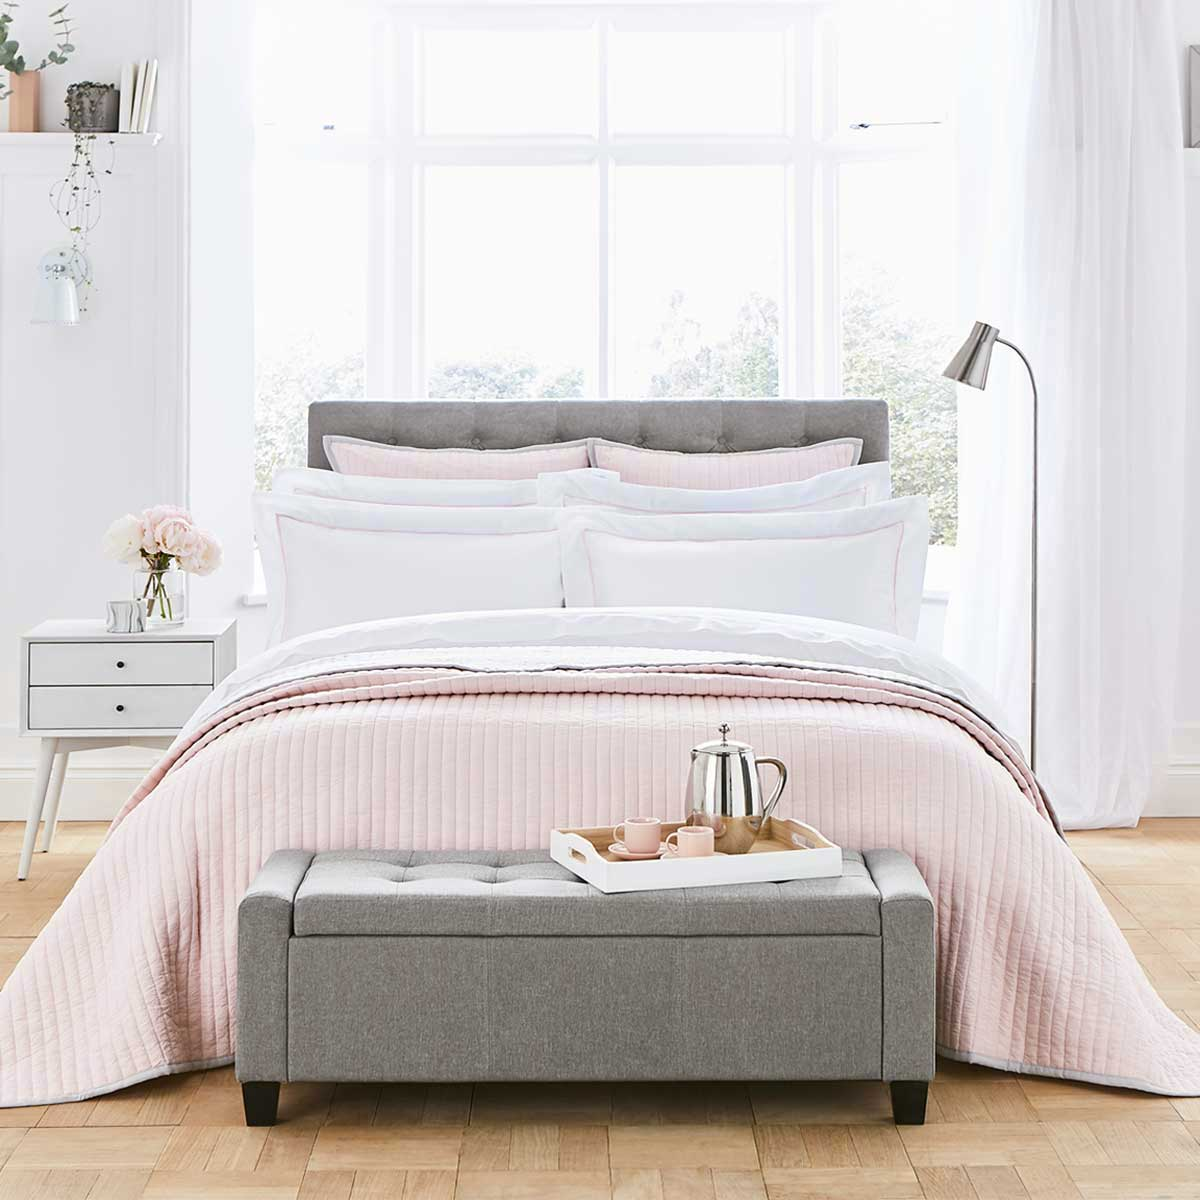 Bedding from Dusk.com